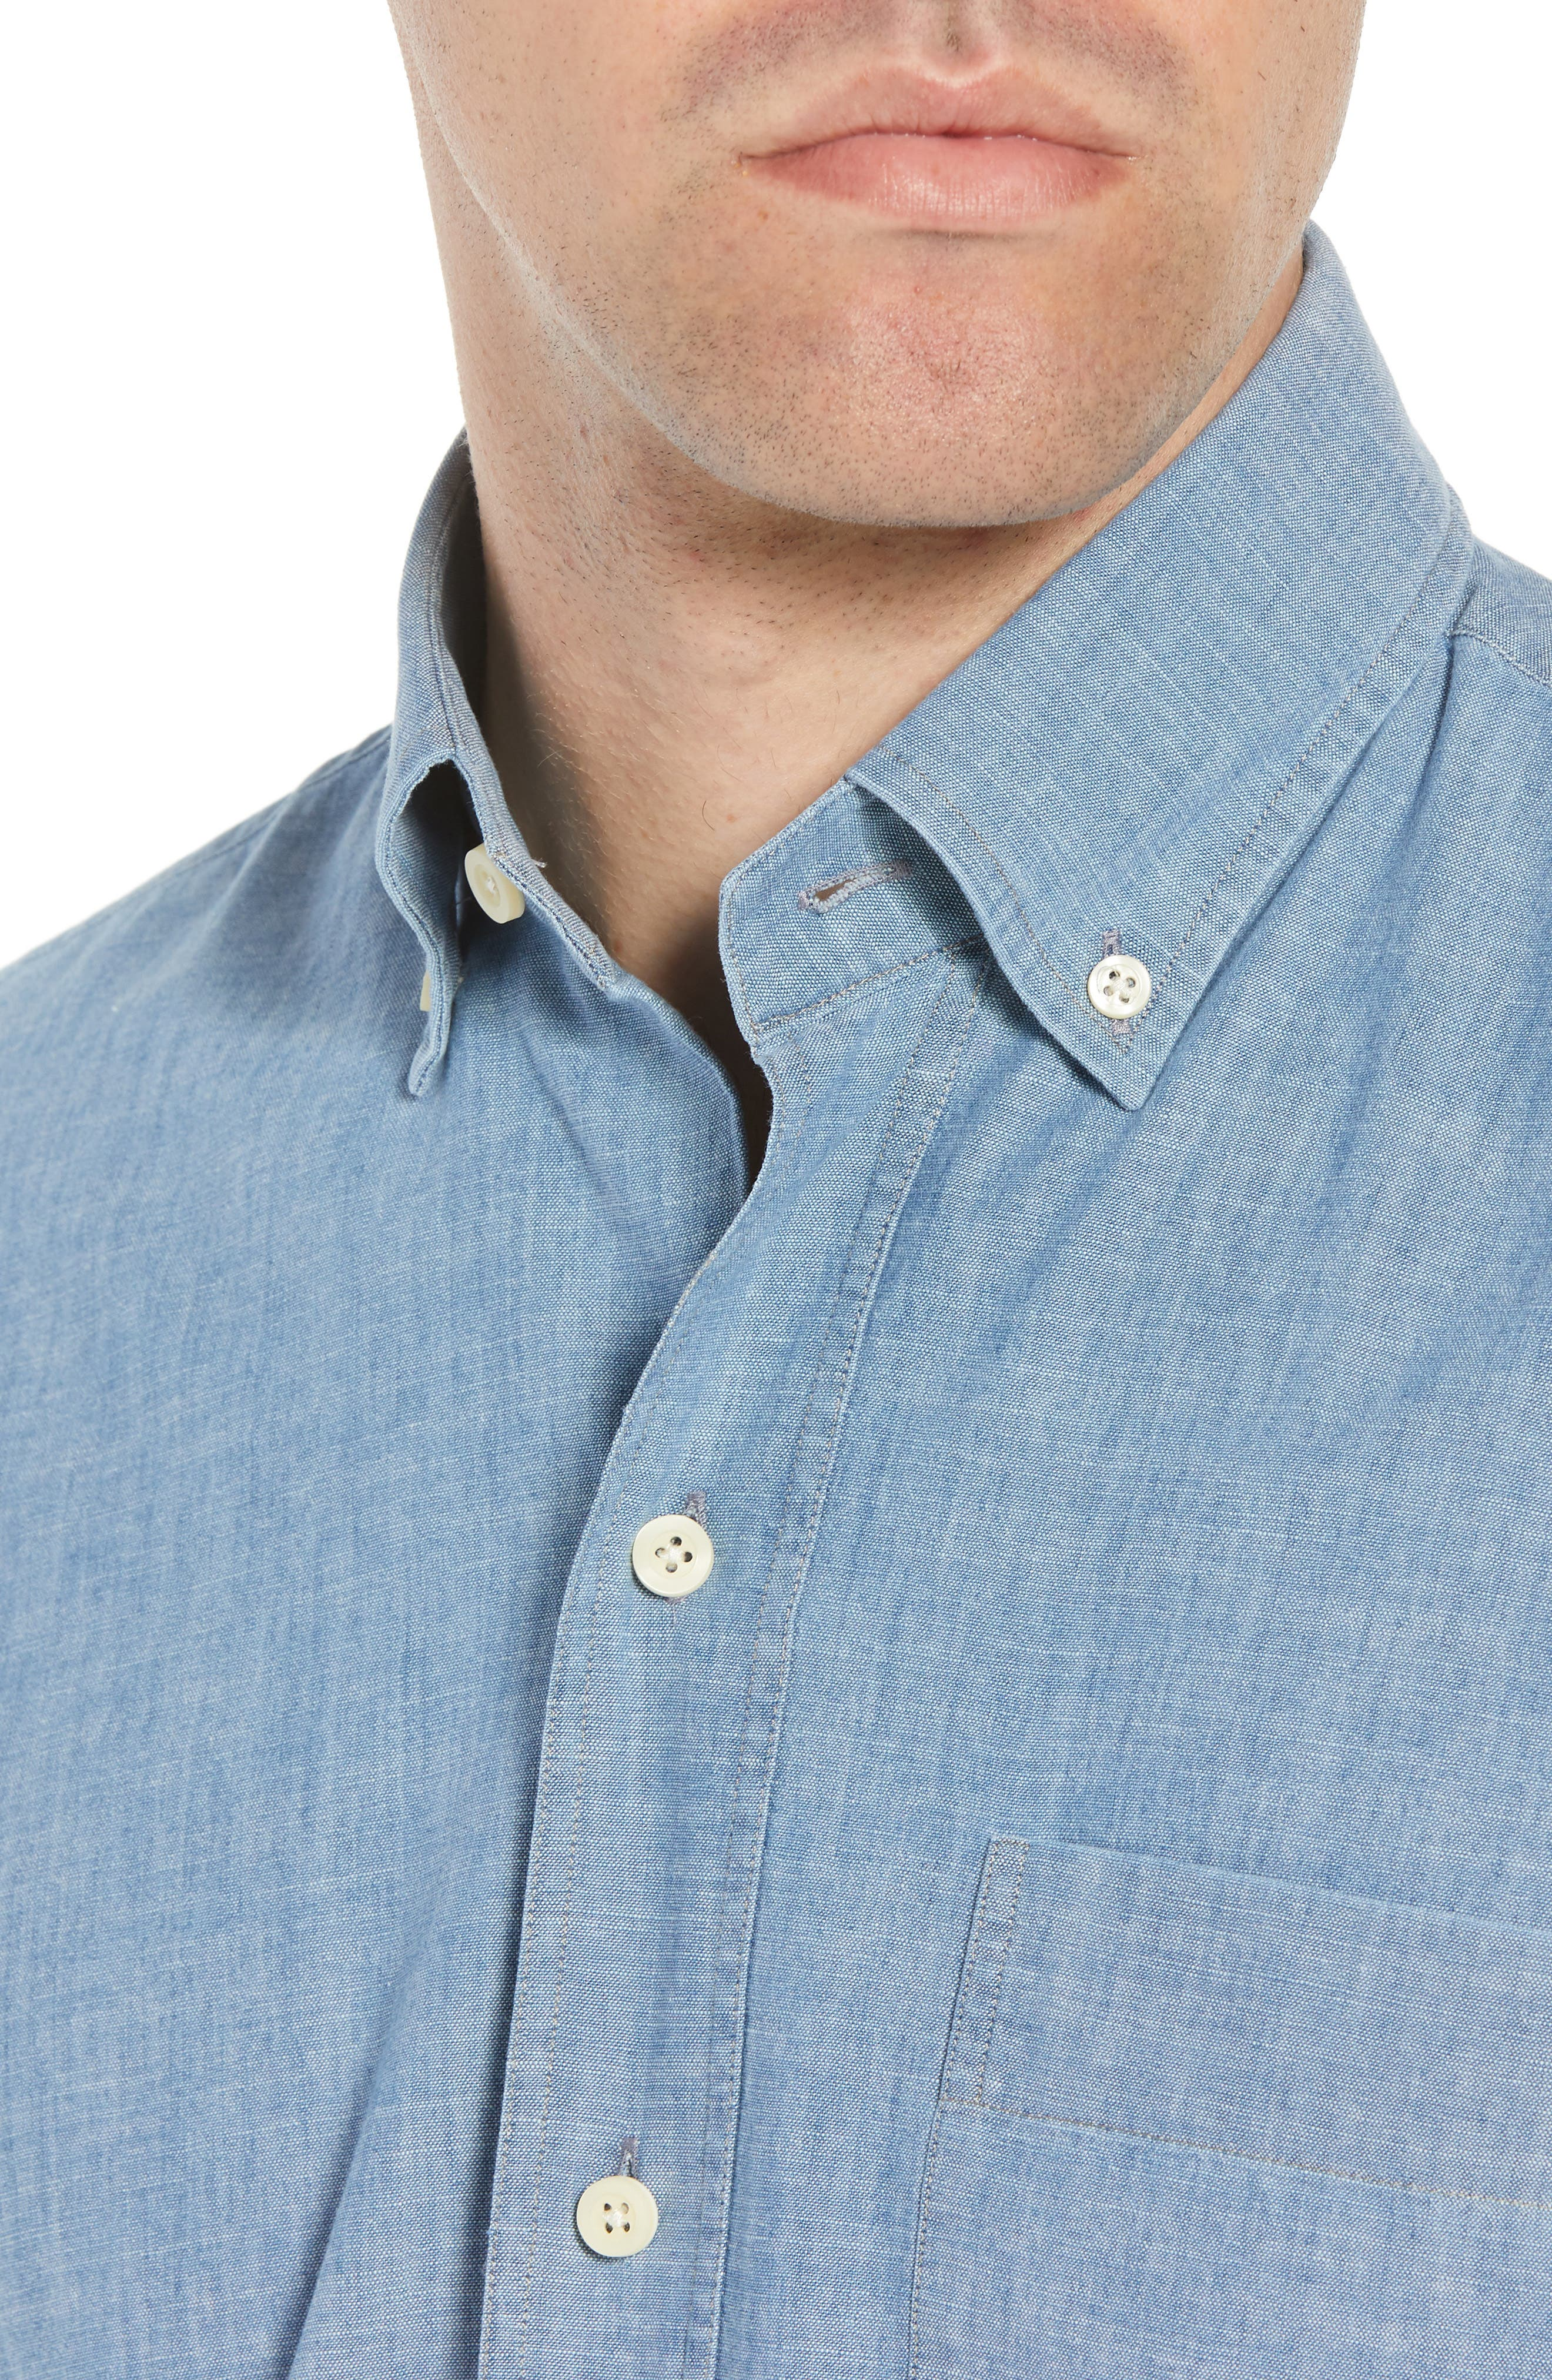 Ancroft Slim Fit Chambray Sport Shirt,                             Alternate thumbnail 4, color,                             Blue